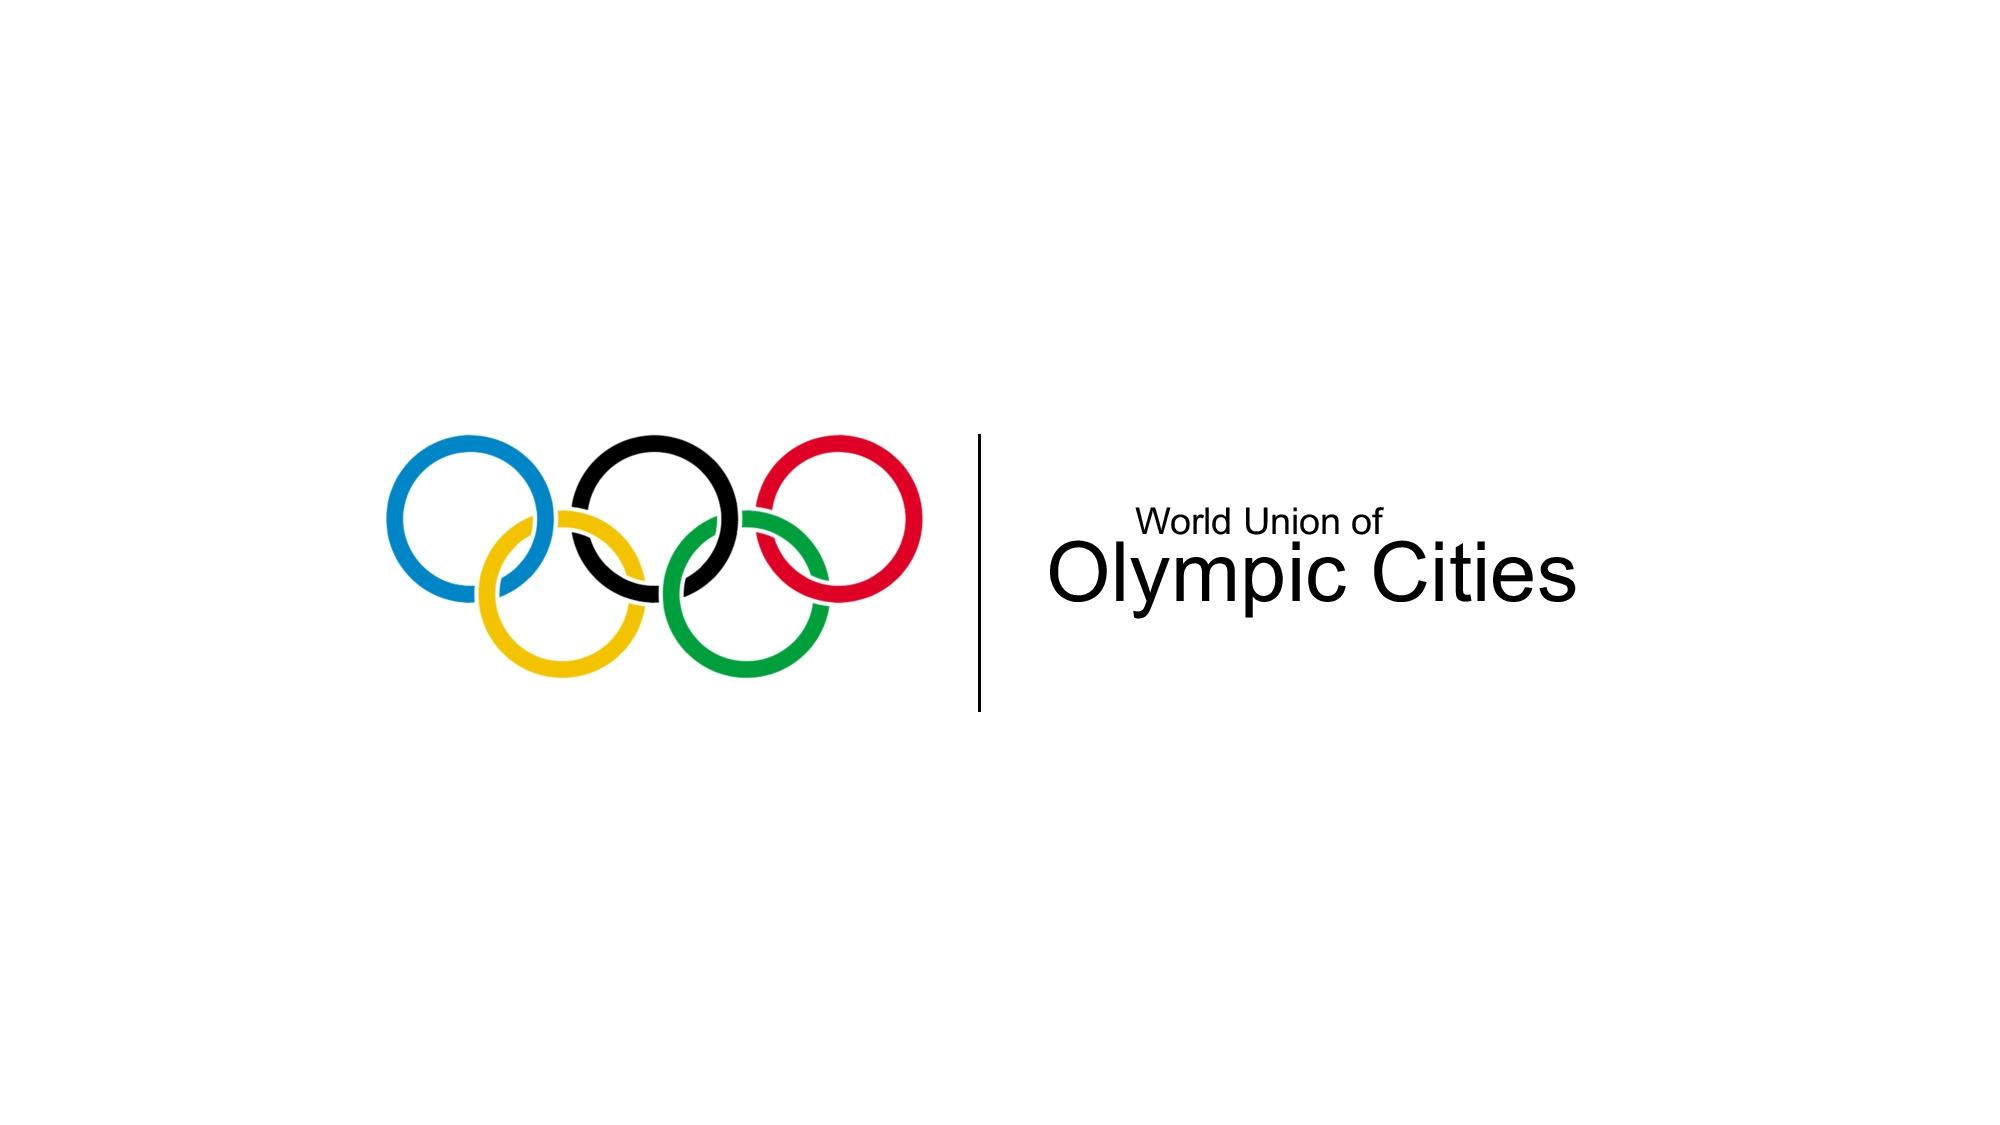 World Union of Oylmpic Cities